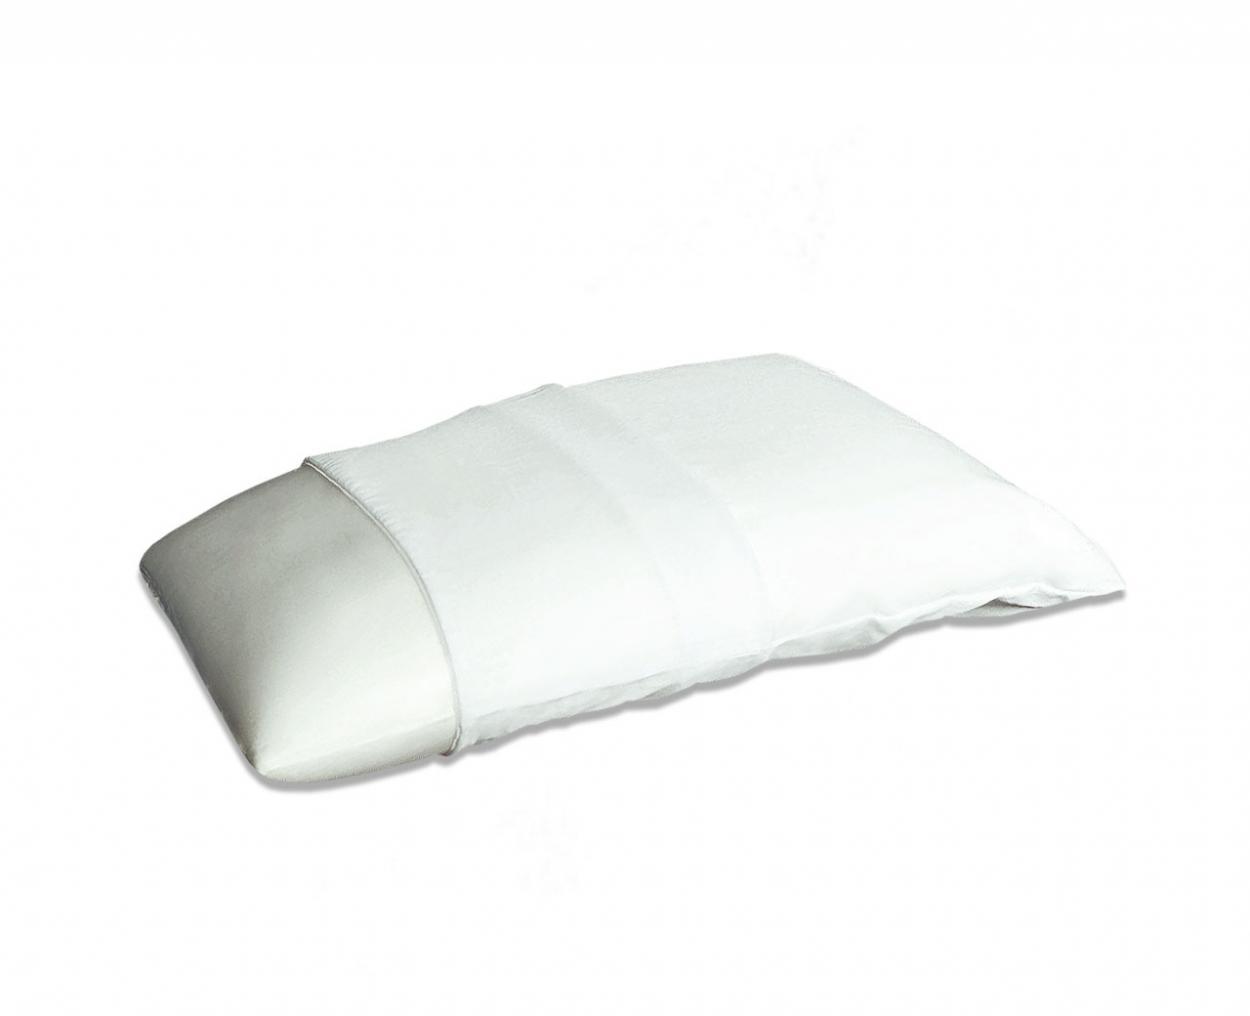 CandiaStrom - Μαξιλάρι Comfort Medic - Συλλογή CLASSIC COLLECTION - Γενική Εικόνα